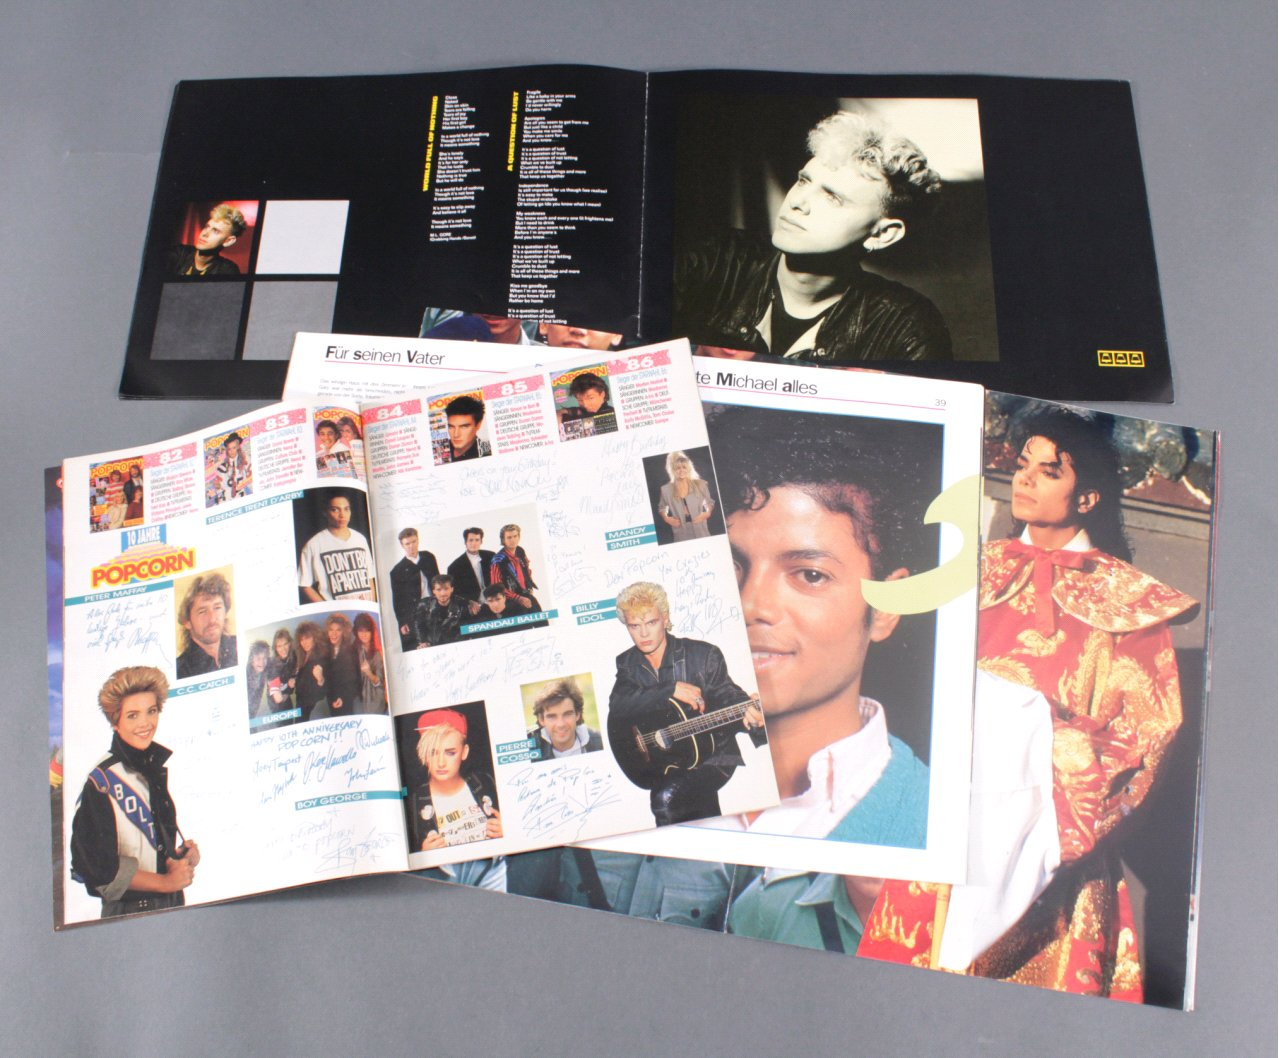 MICHAEL JACKSON WORLD TOUR 1988, DEPECHE MODE TOUR 1986-1